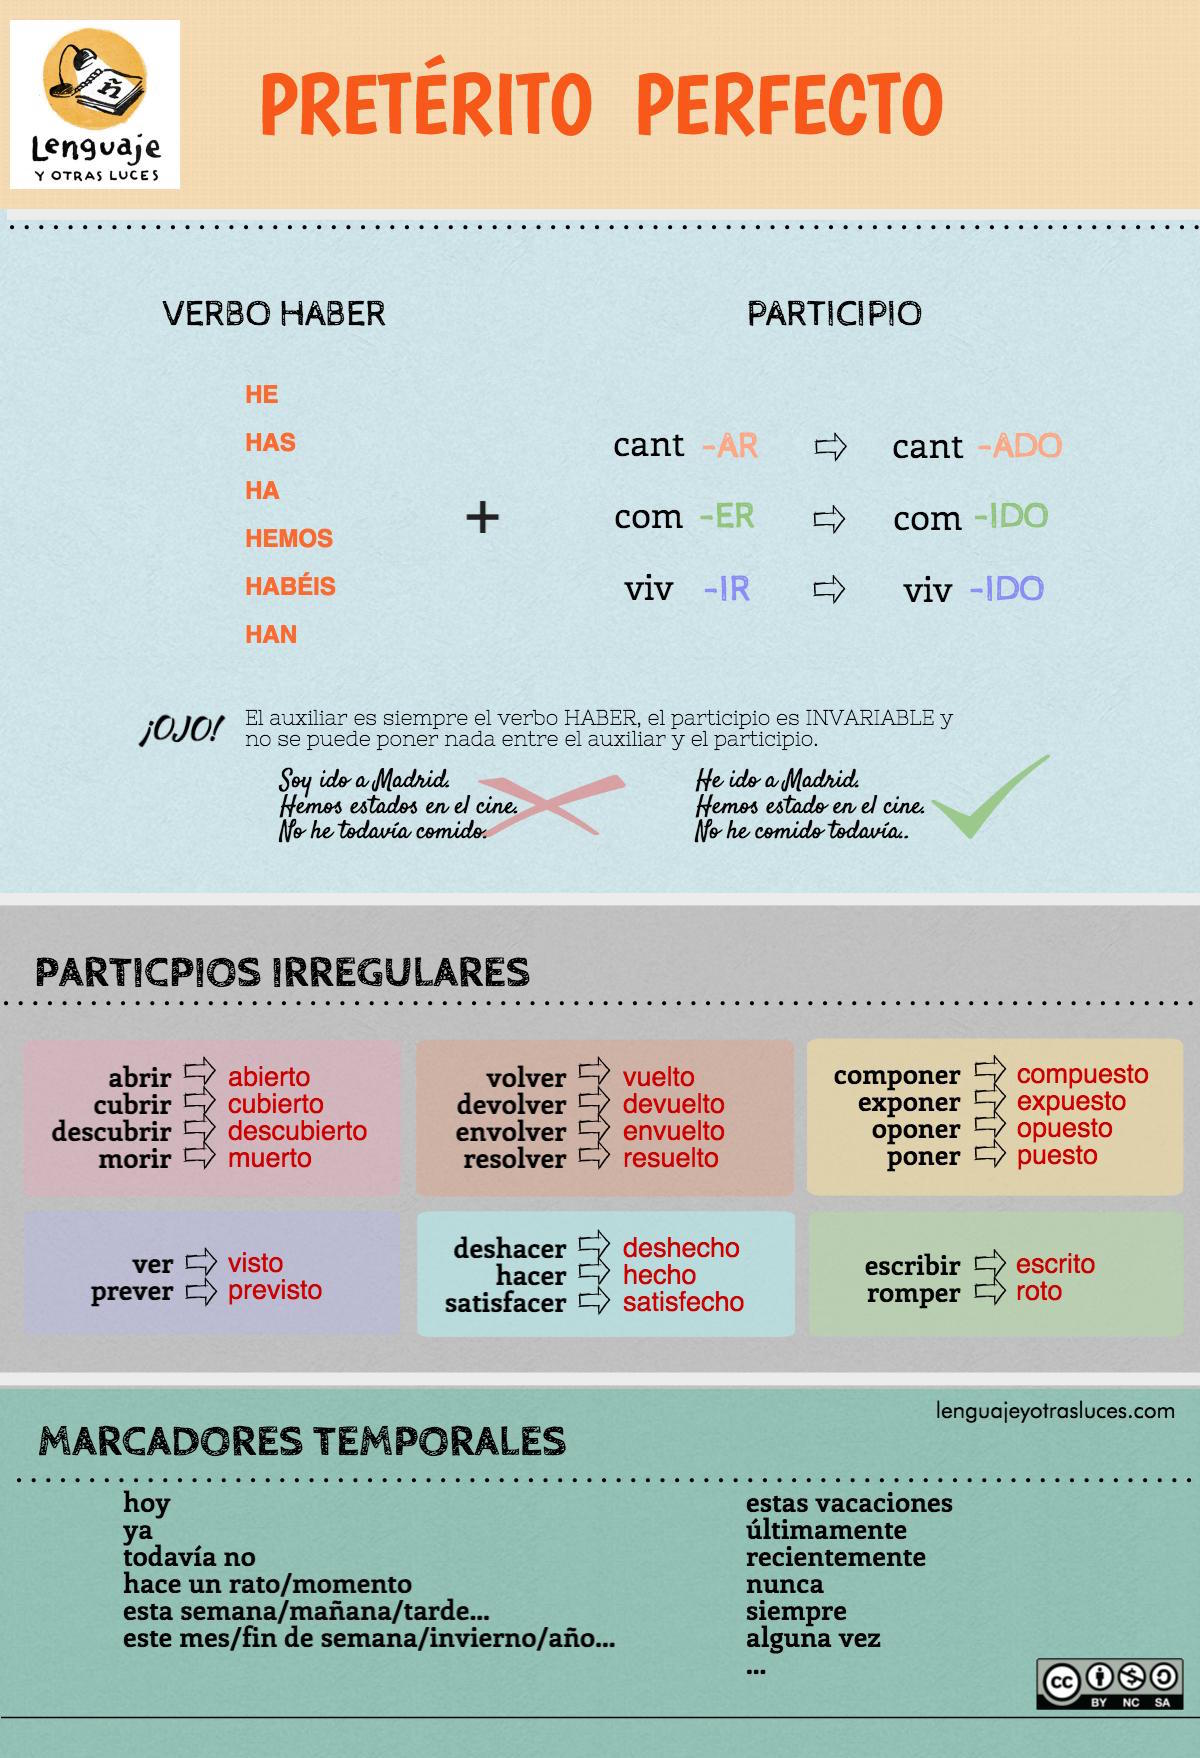 https://lenguajeyotrasluces.files.wordpress.com/2016/10/preterito-perfecto-infografia.jpeg